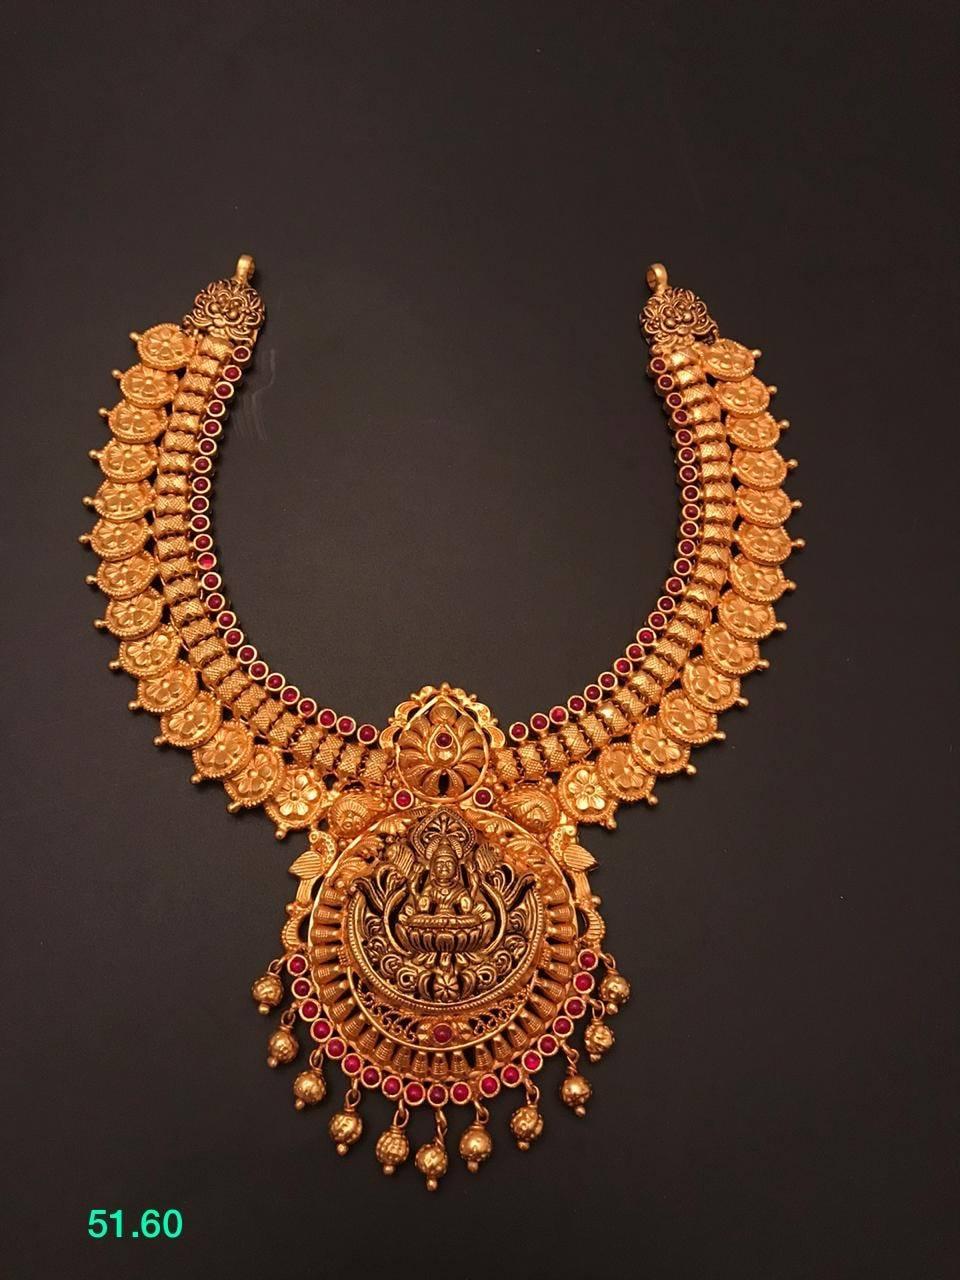 Stunning one gram gold Lakshmi ji kasu necklace with Lakshmi devi pendant. 1 gram gold mix jewellery chilakalapudi one gram gold jewellery 1 gram gold bridal sets with price